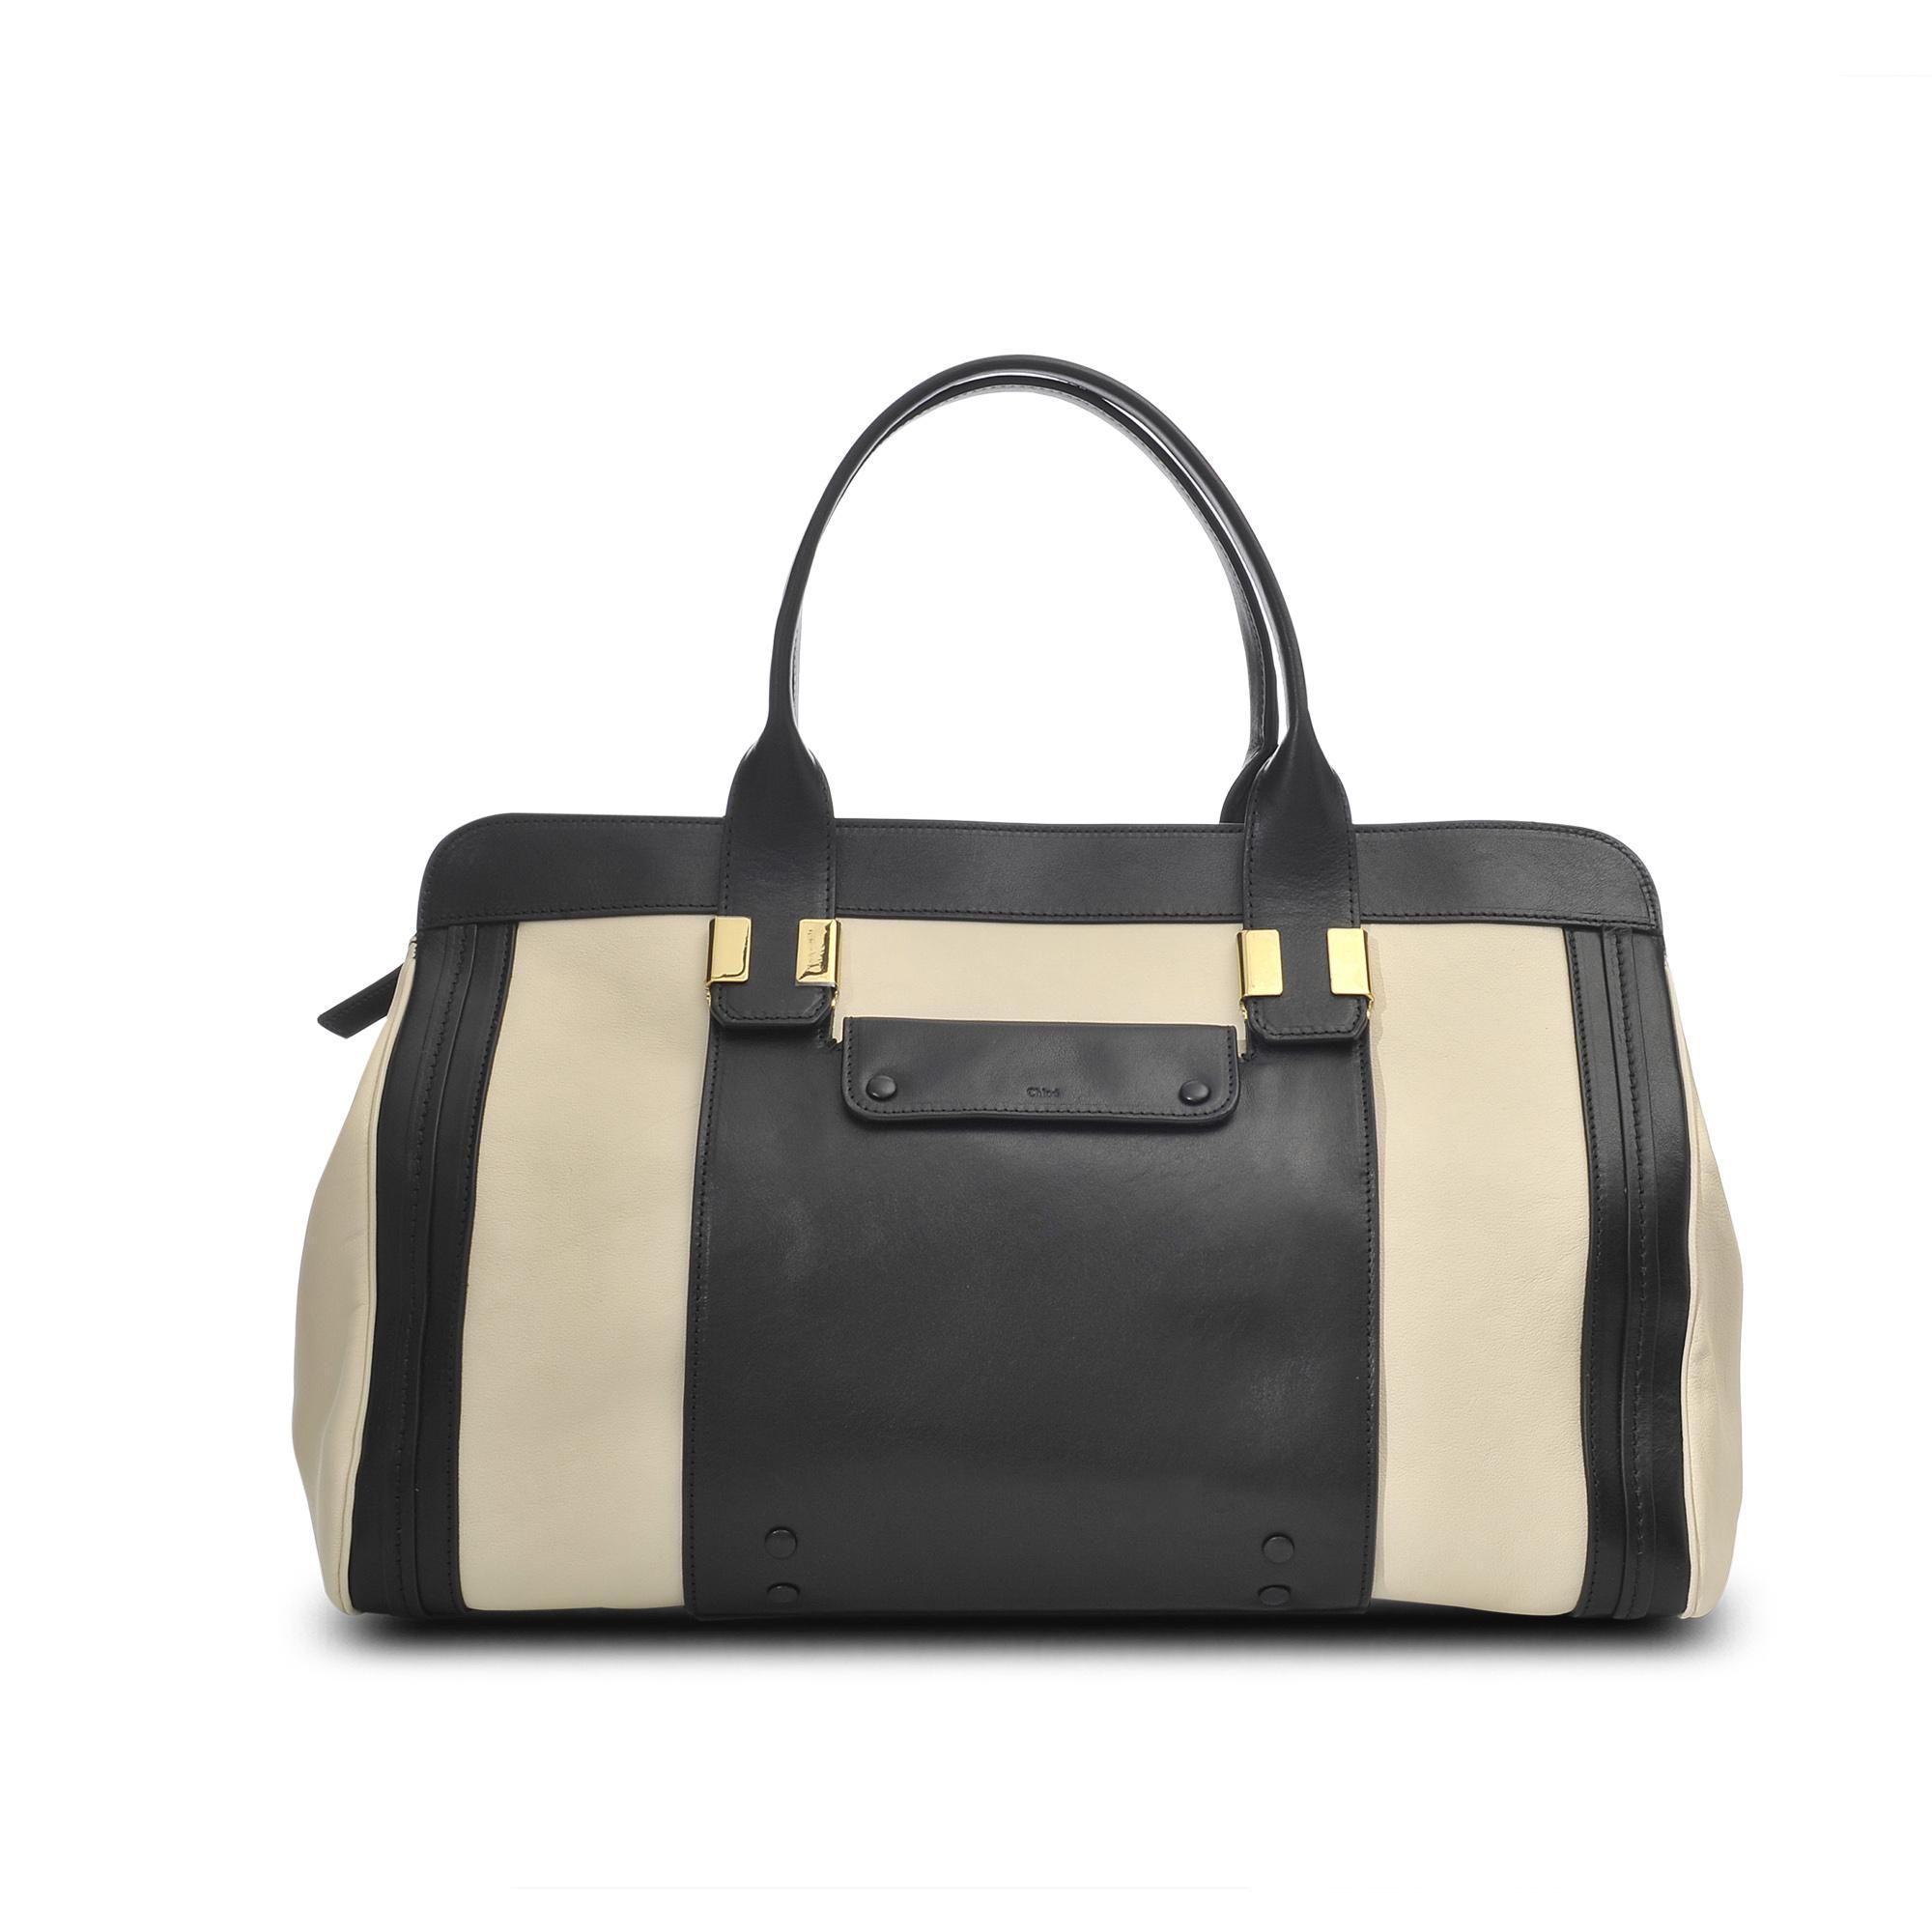 05d0b4939f Grand sac Alice cuir bicolore - Chloé -Monnier Frères